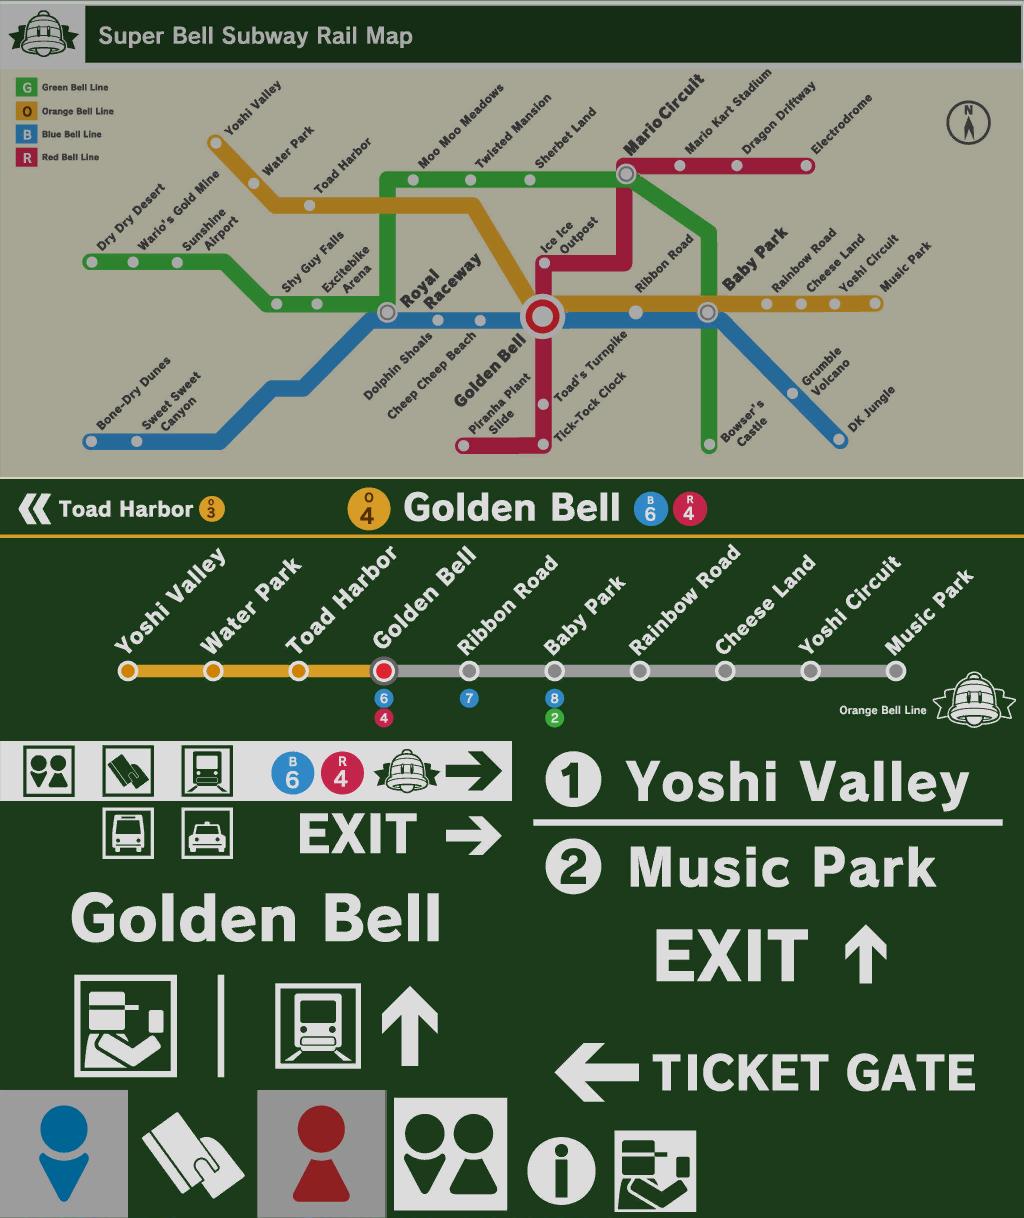 Subway Map Sign.Super Bell Subway Super Mario Wiki The Mario Encyclopedia